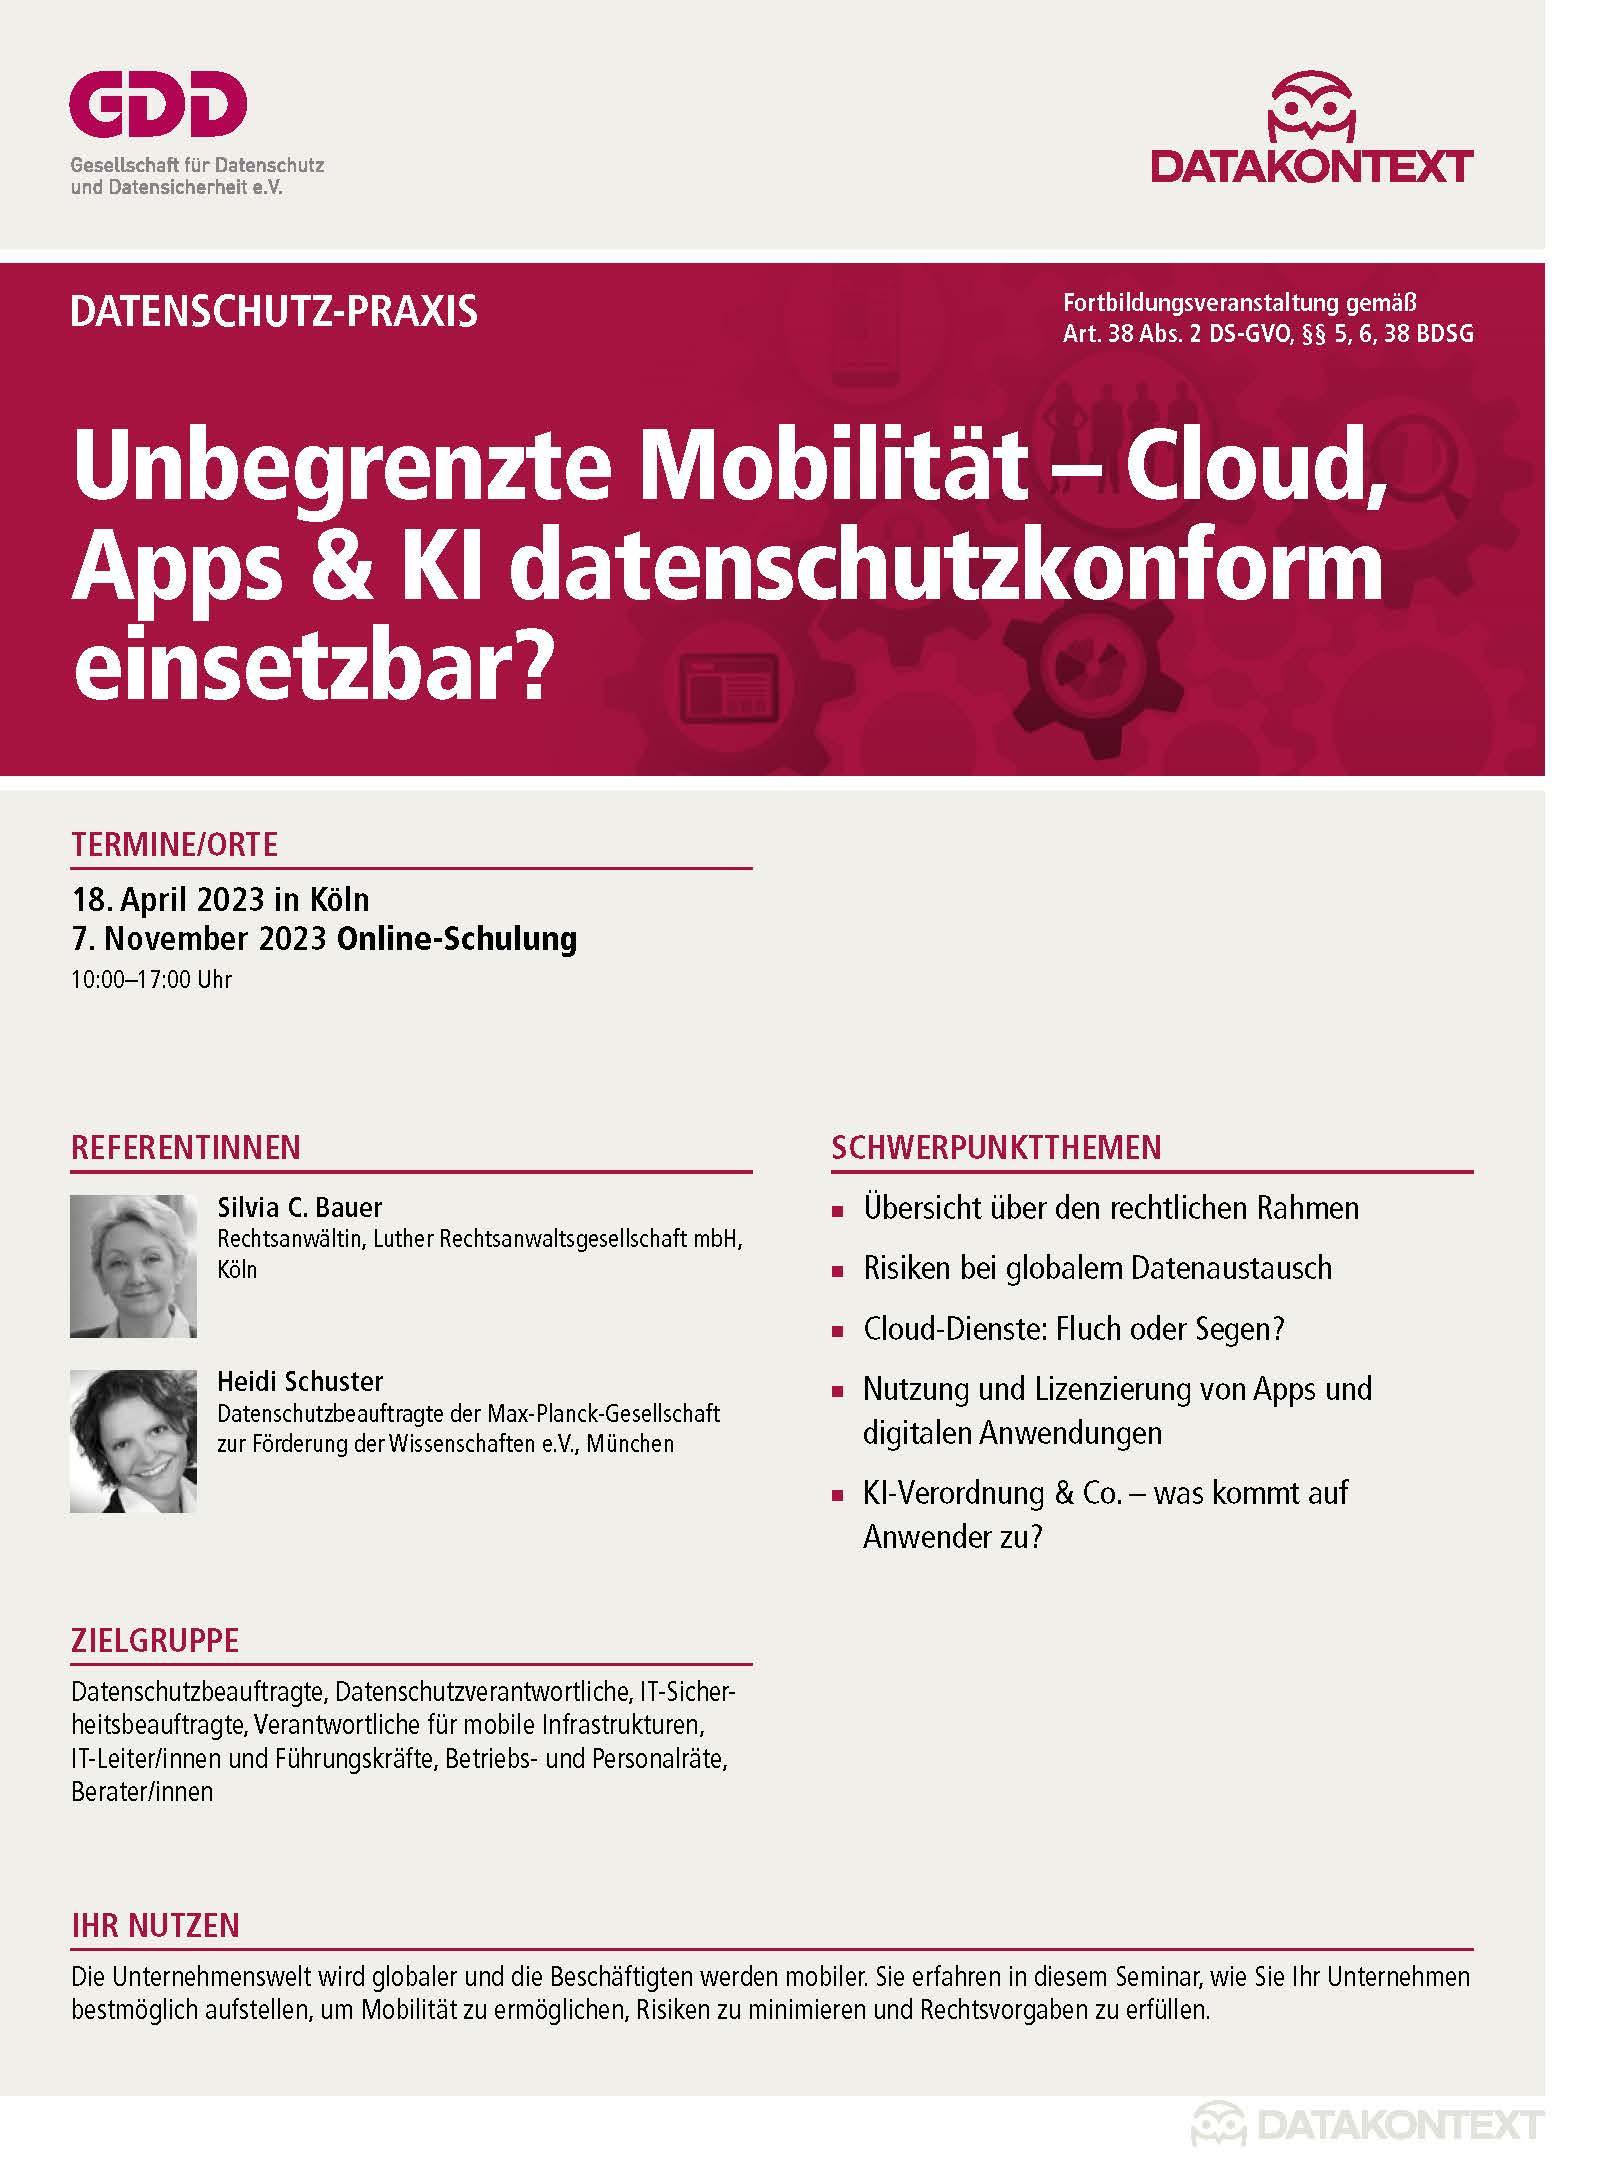 Mobile Endgeräte im Zeitalter von DS-GVO und e-Privacy-VO